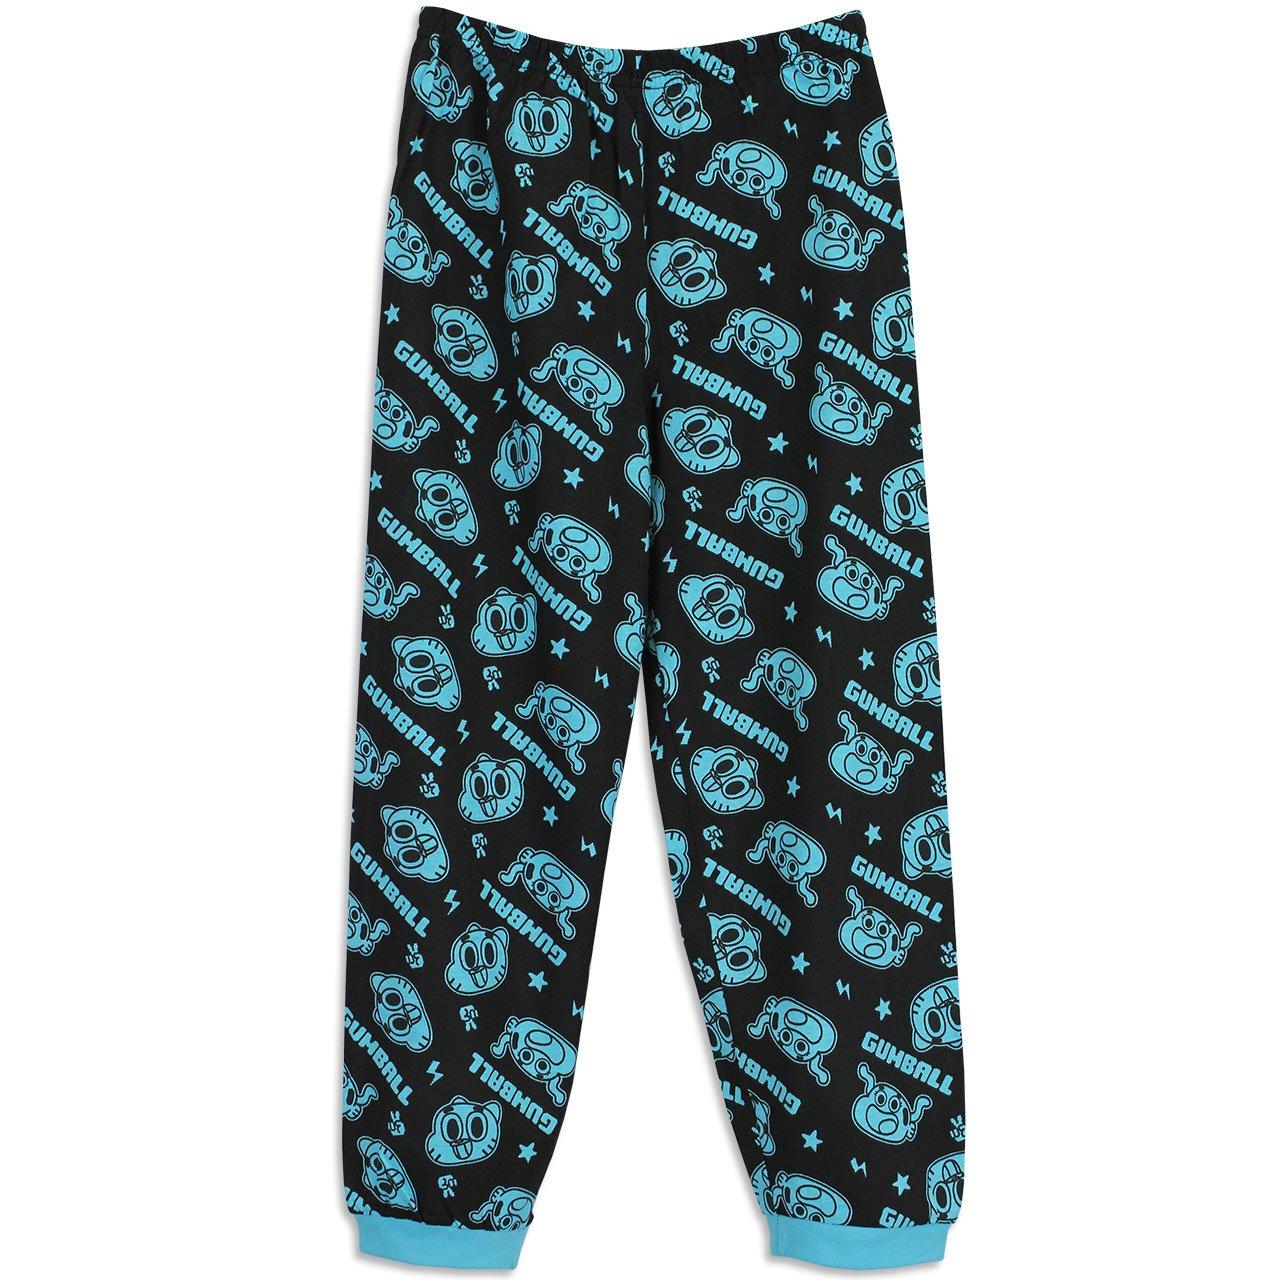 The Amazing World of Gumball Boys Pajamas